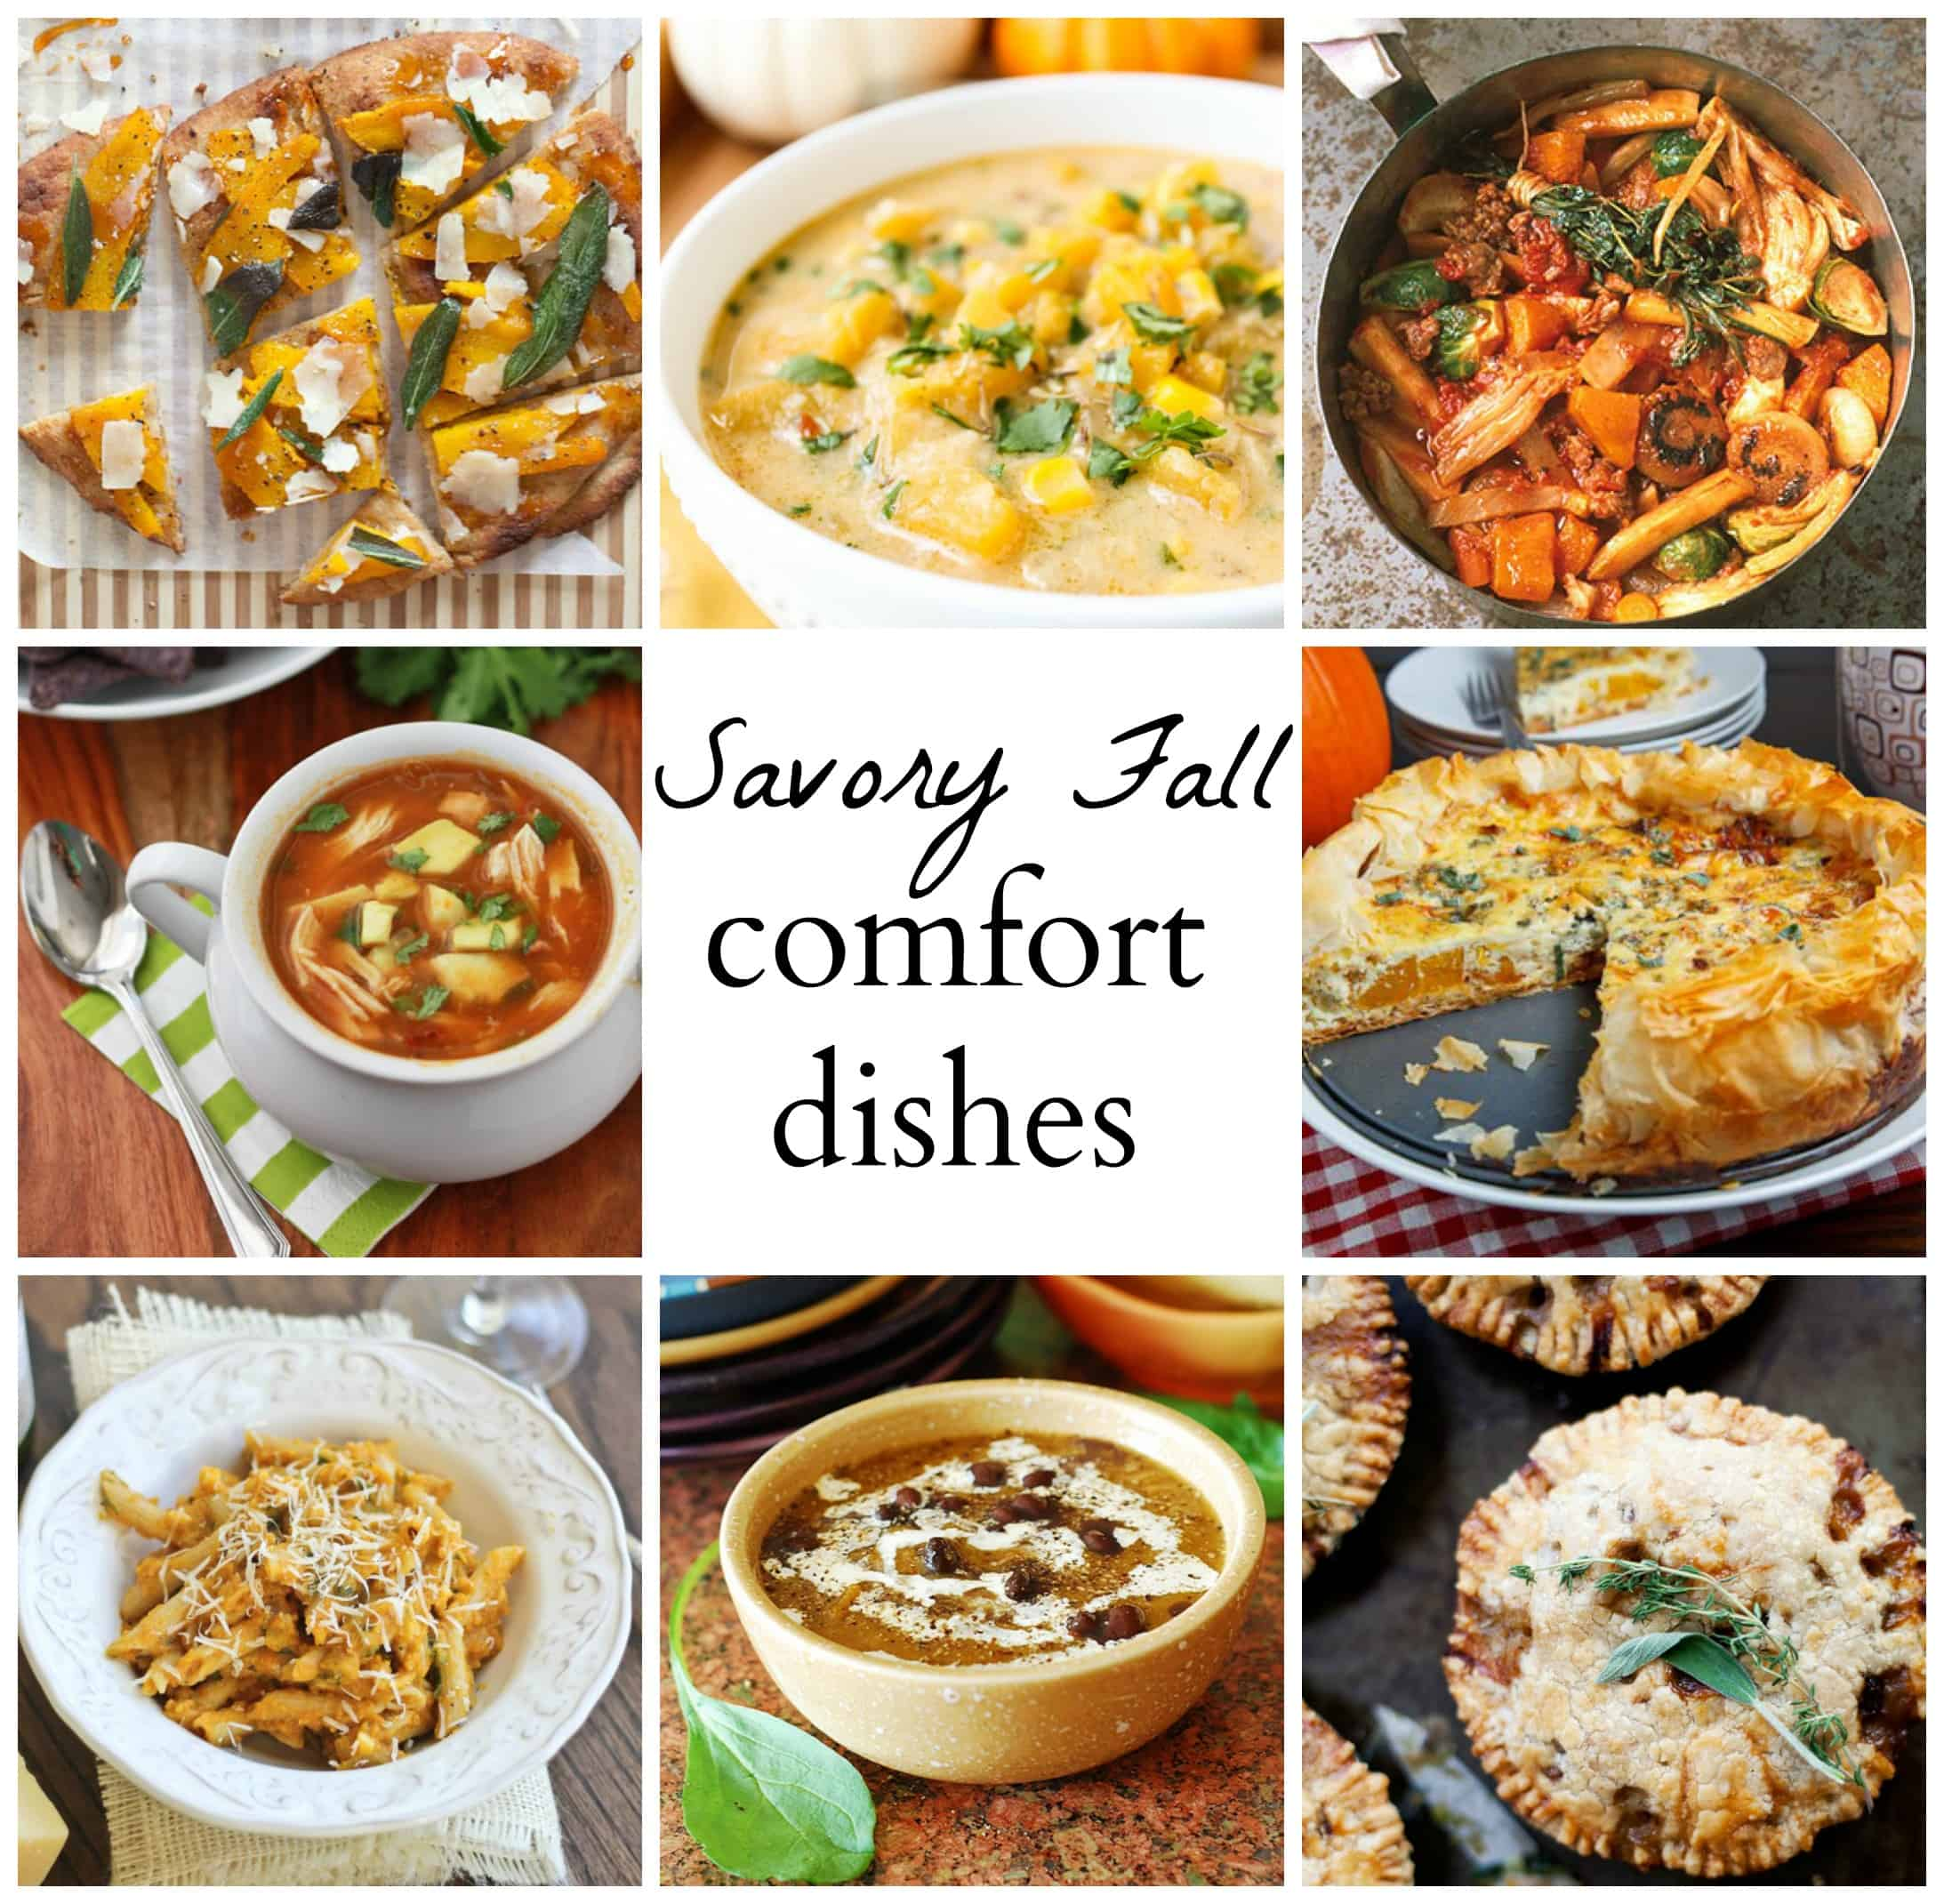 Savory Fall Pumpkin Dishes